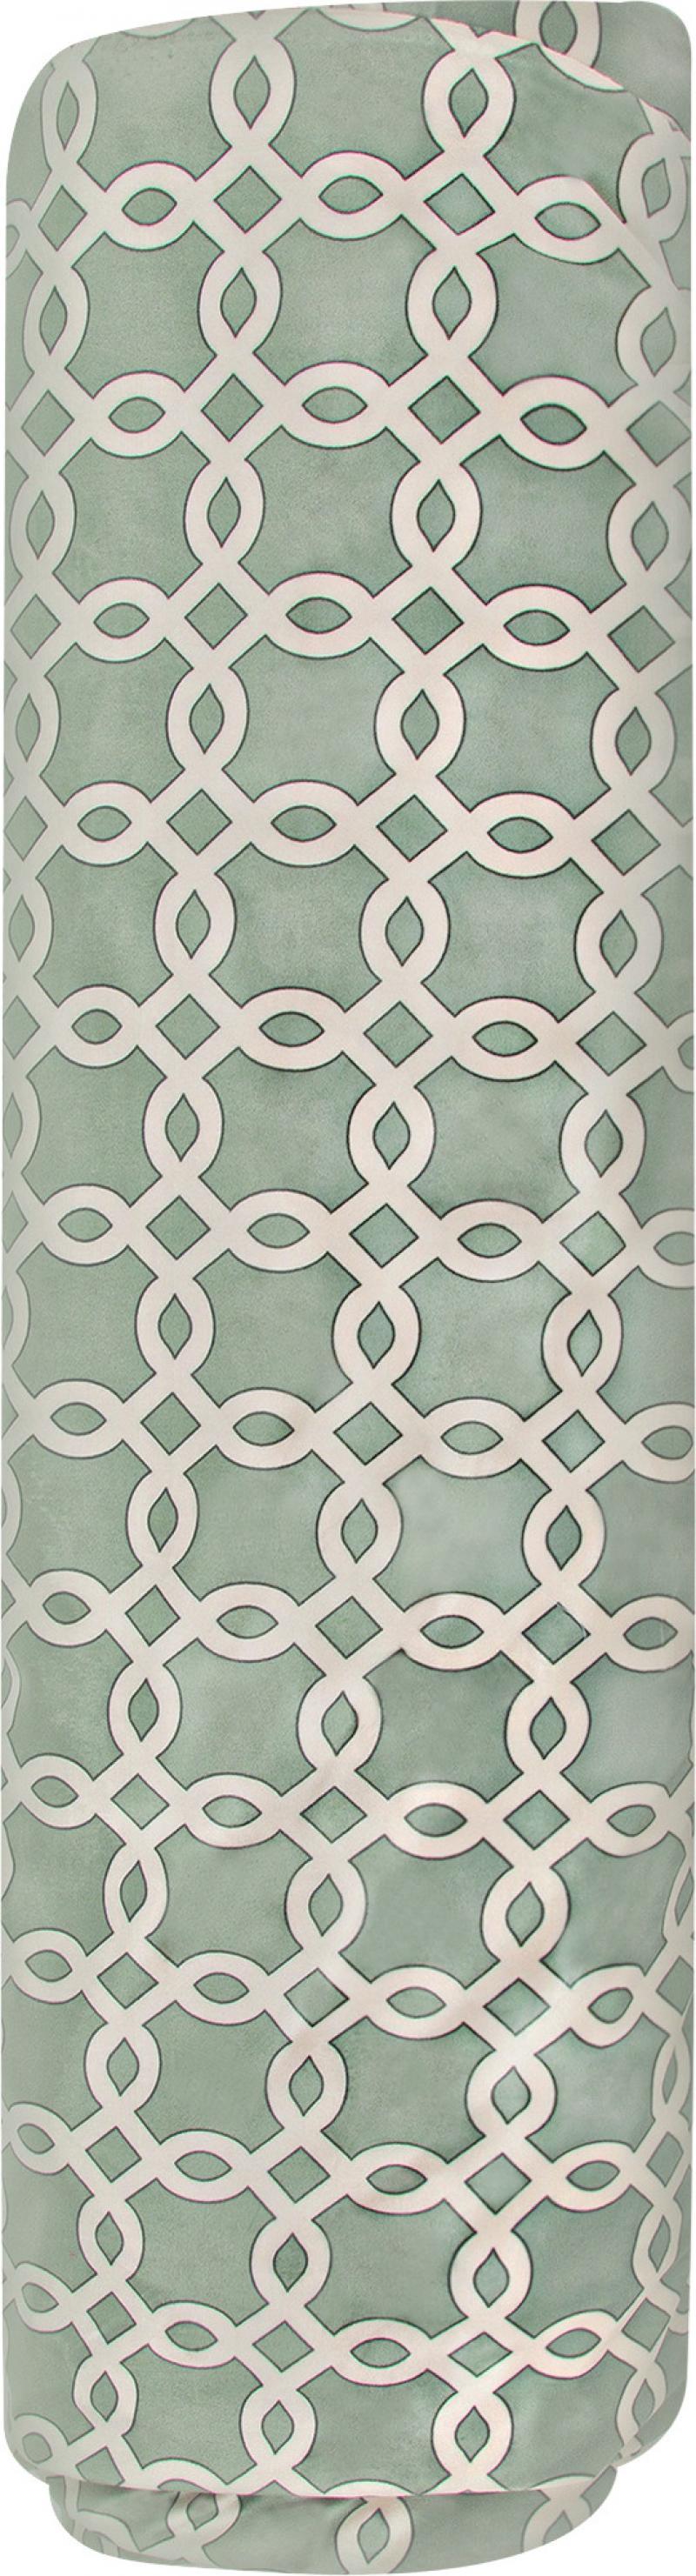 Ткань 1 п/м, велюр, 280 см, цвет зелёный